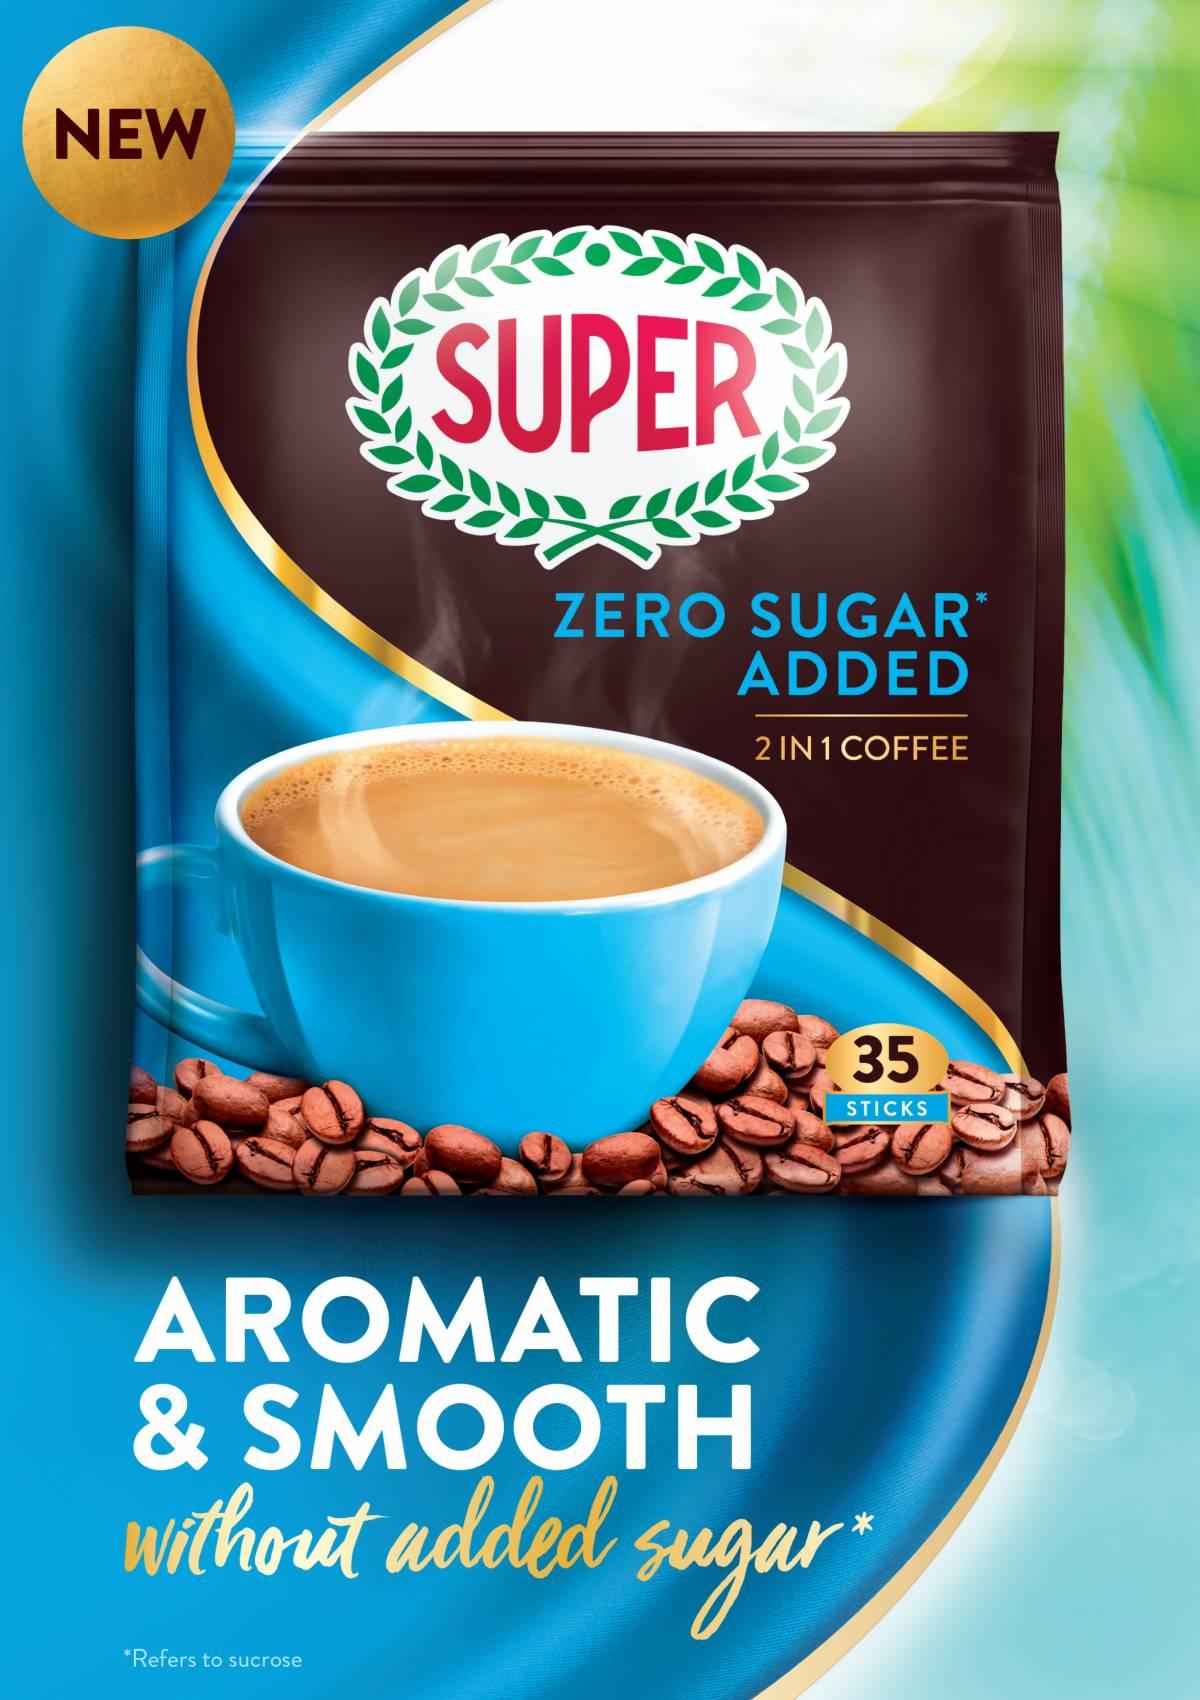 Super Coffee Comes to Singapore